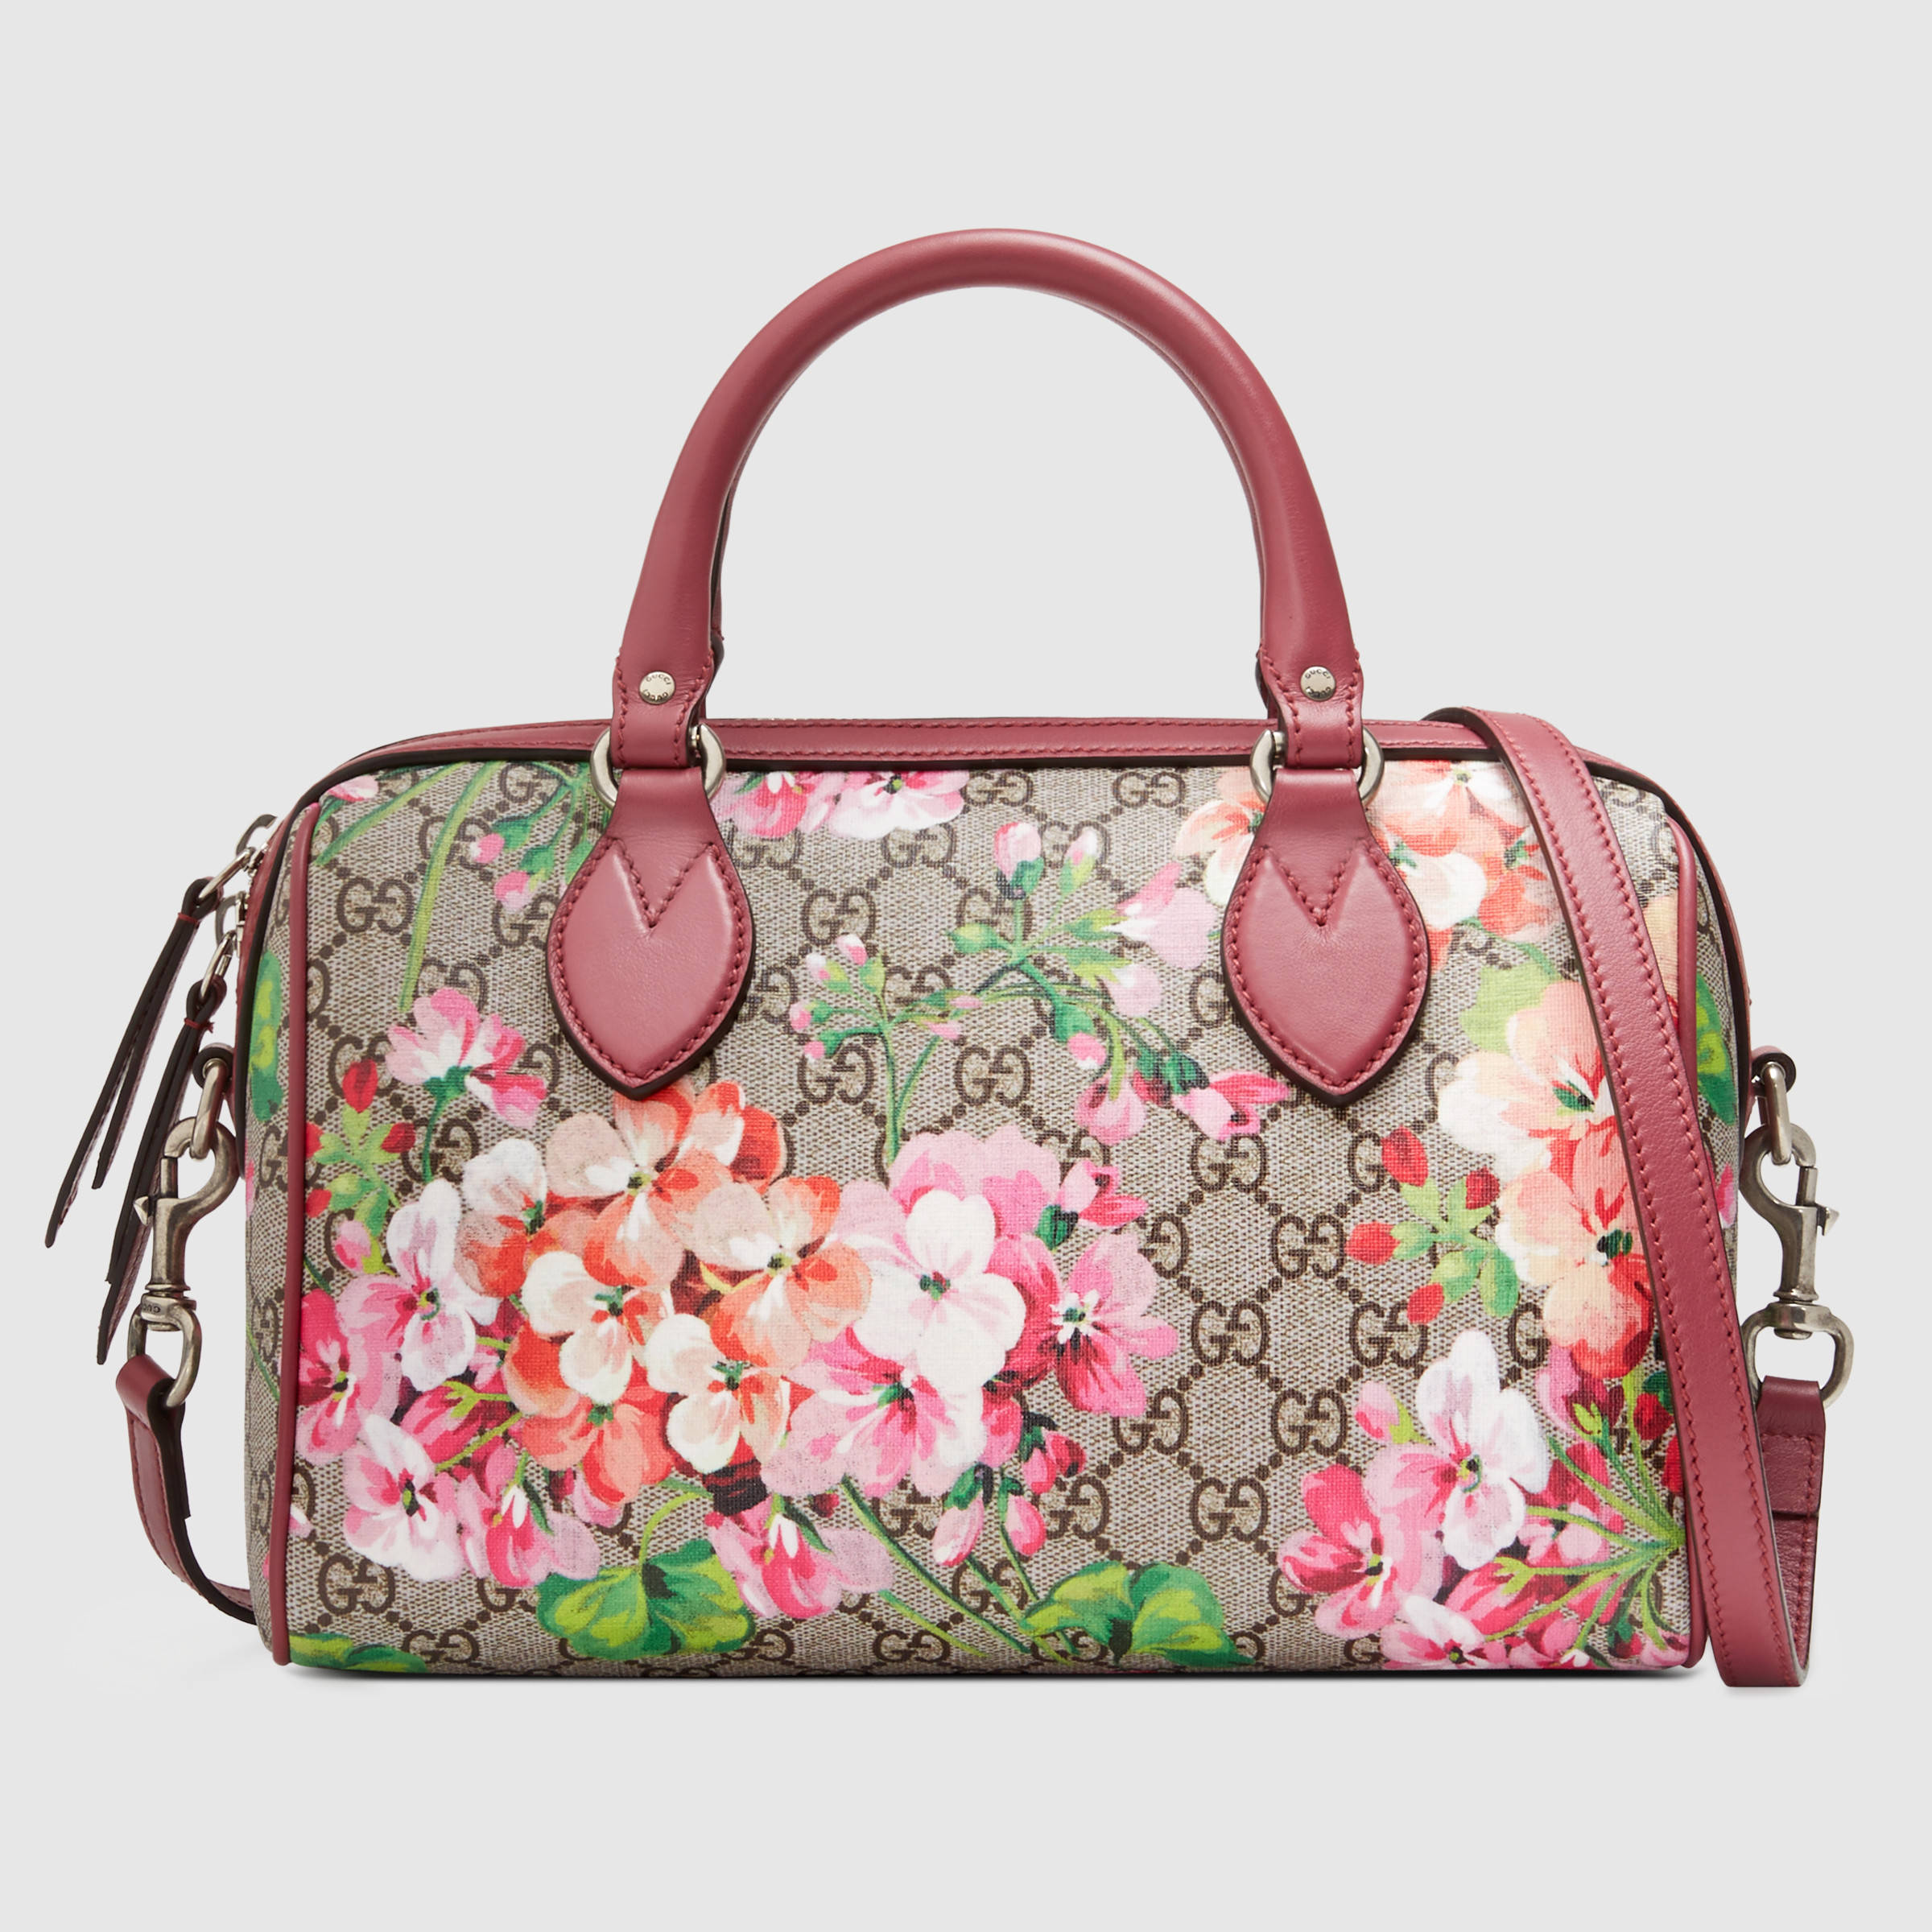 409529_KU2IN_8693_001_070_0000_Light-Blooms-GG-Supreme-top-handle-bag.jpg